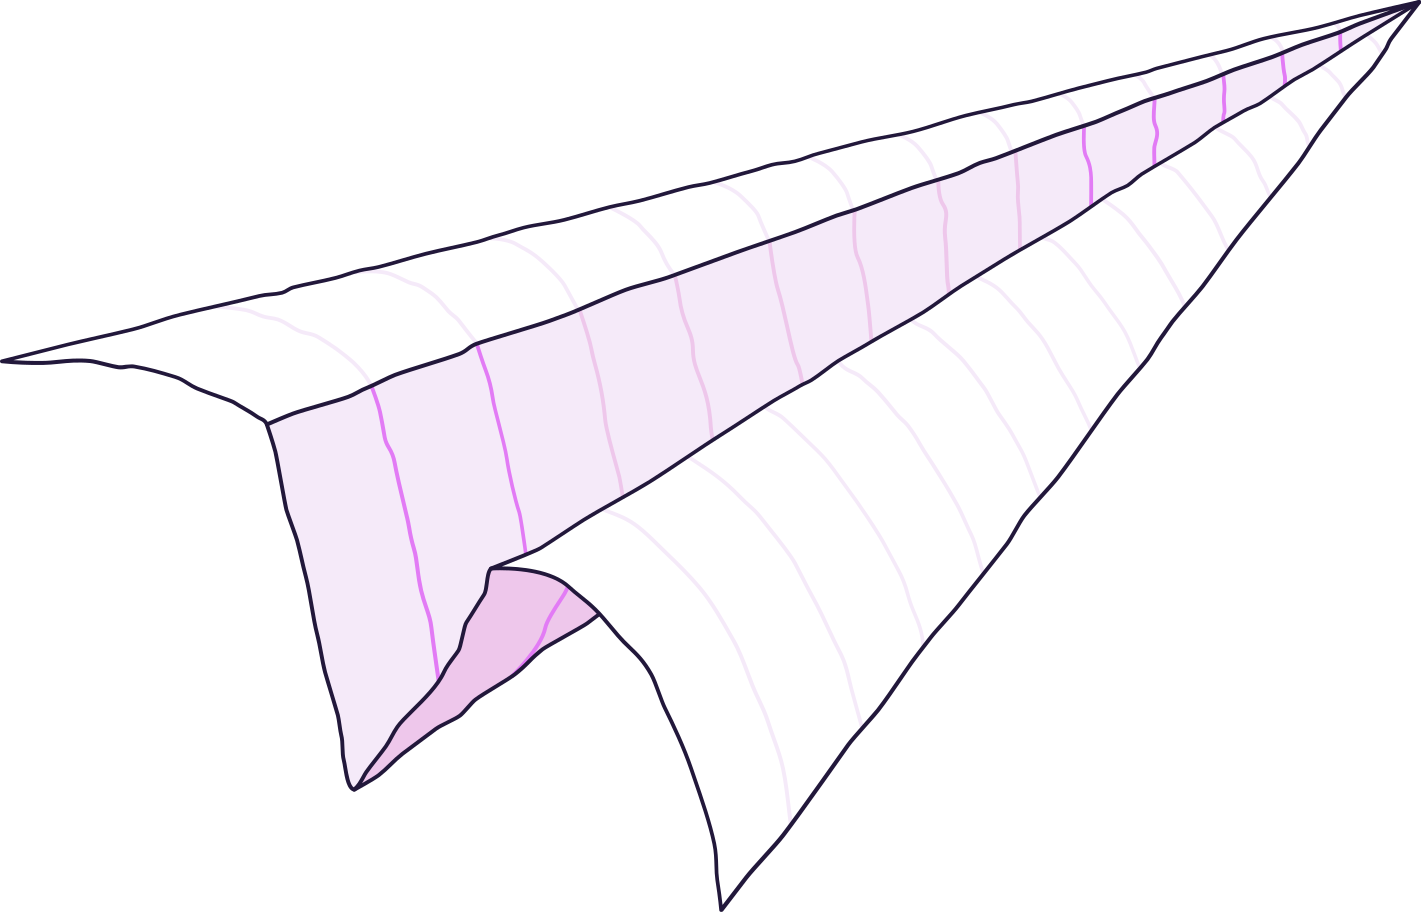 paper-plane- Clipart illustration in PNG, SVG